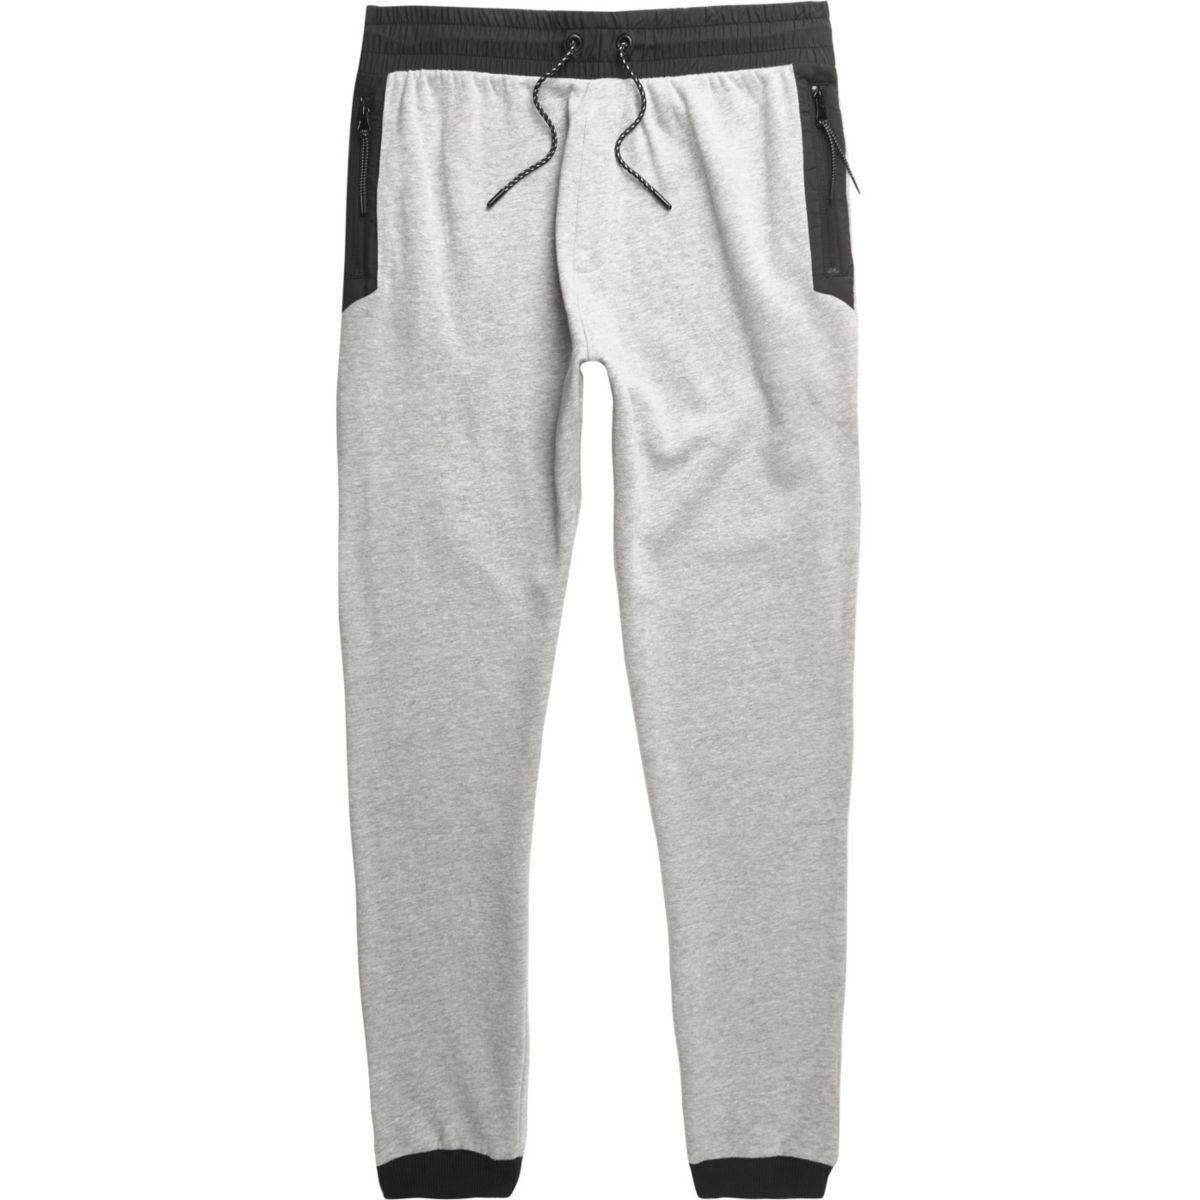 Marl grey contrast trims joggers